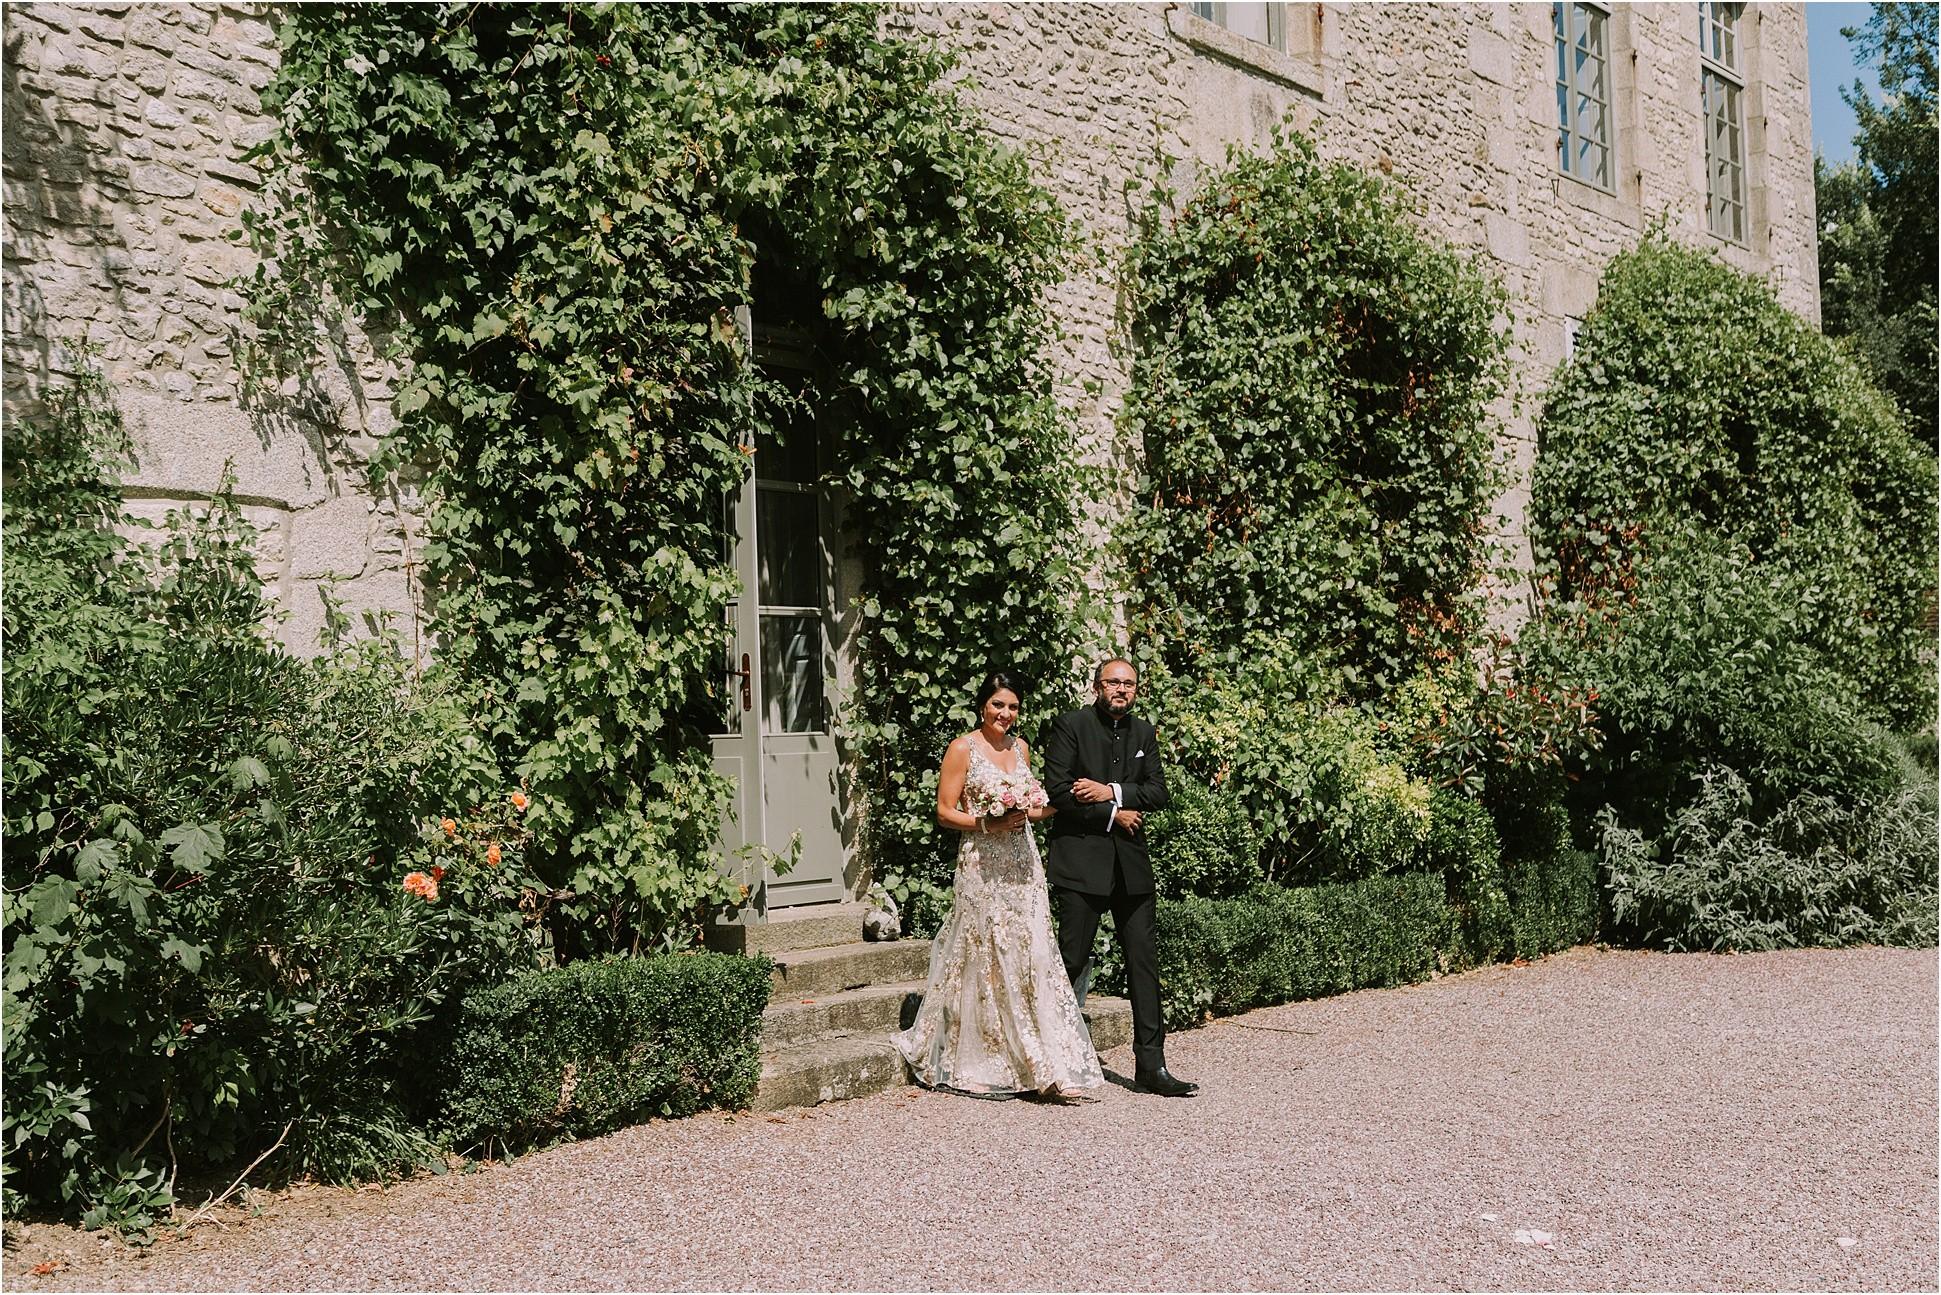 Kateryna-photos-photographe-mariage-chateau-st-paterne-mayenne-normandie_0114.jpg